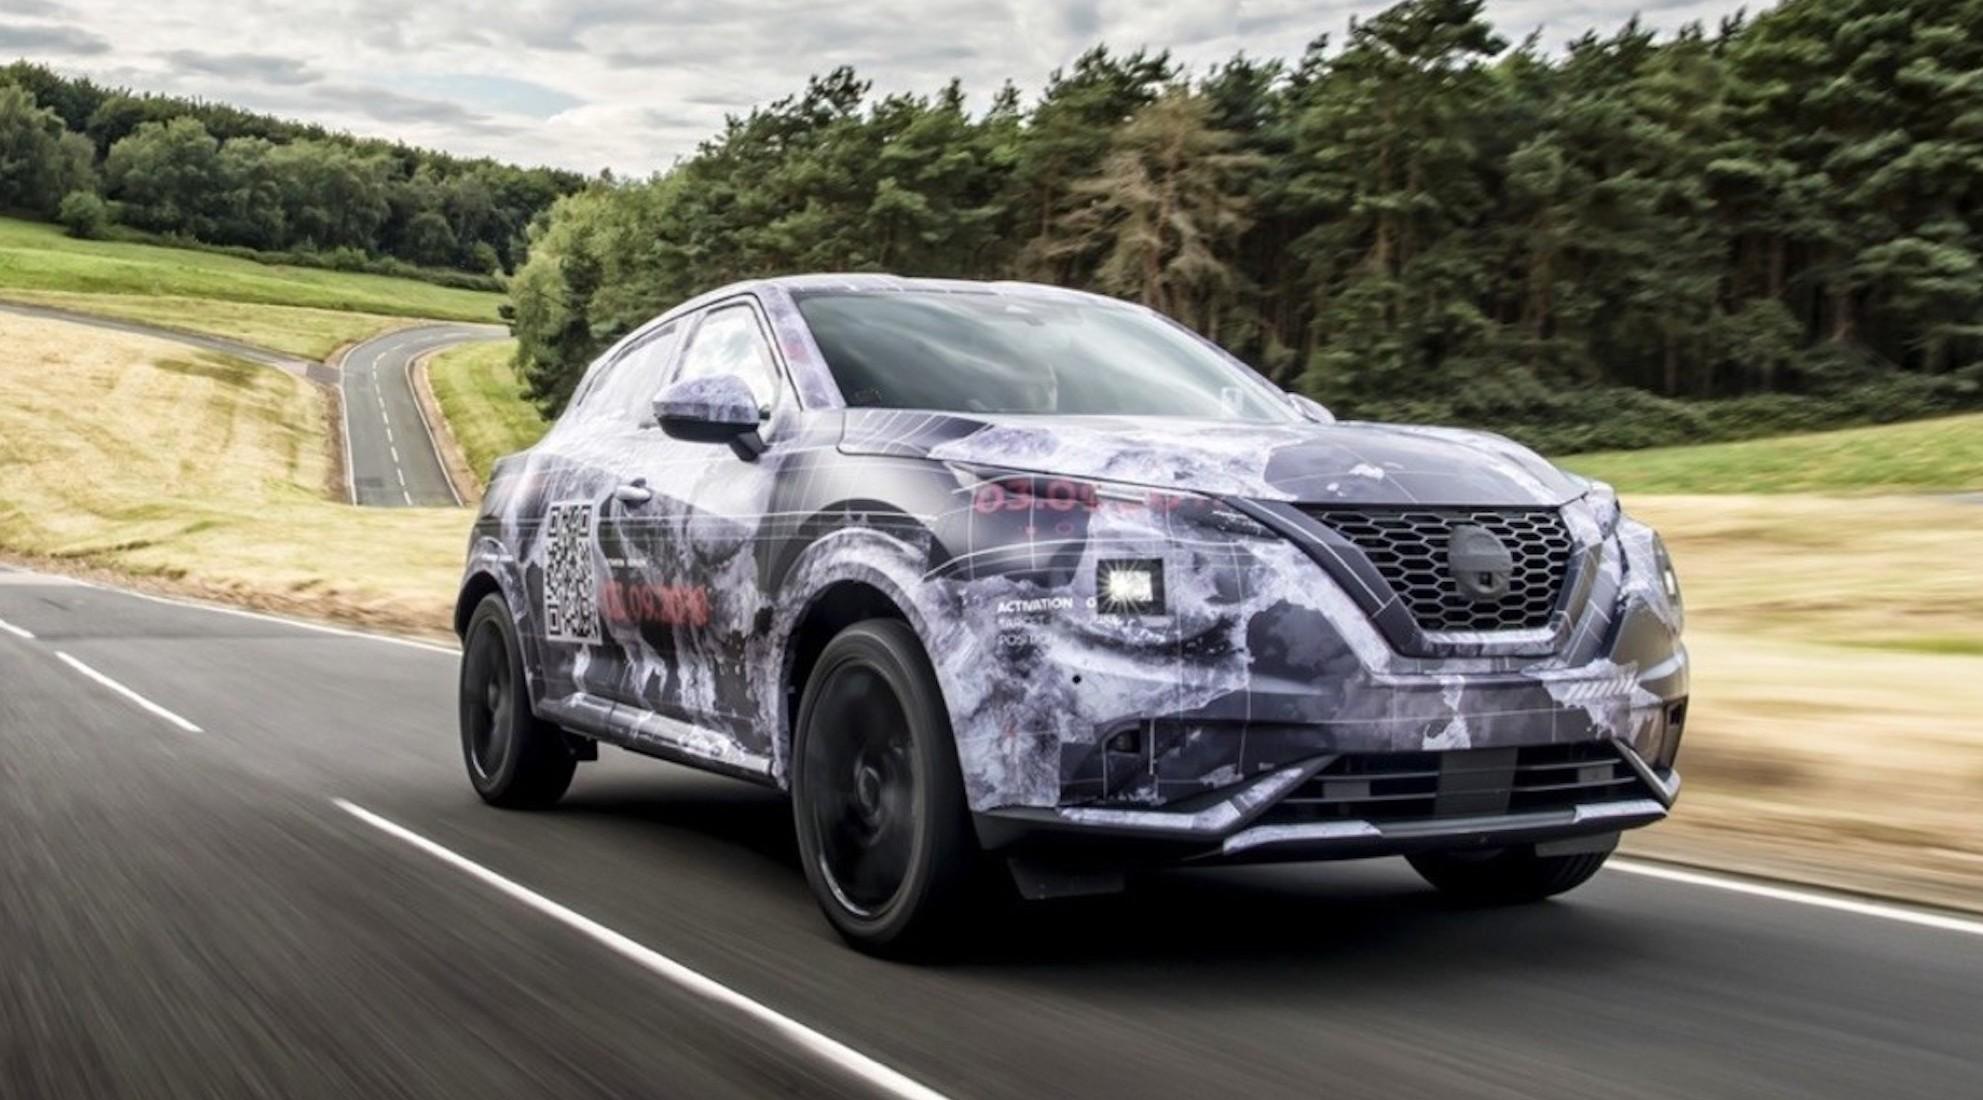 Nissan Juke 2019-2020 prezzi listino, mo